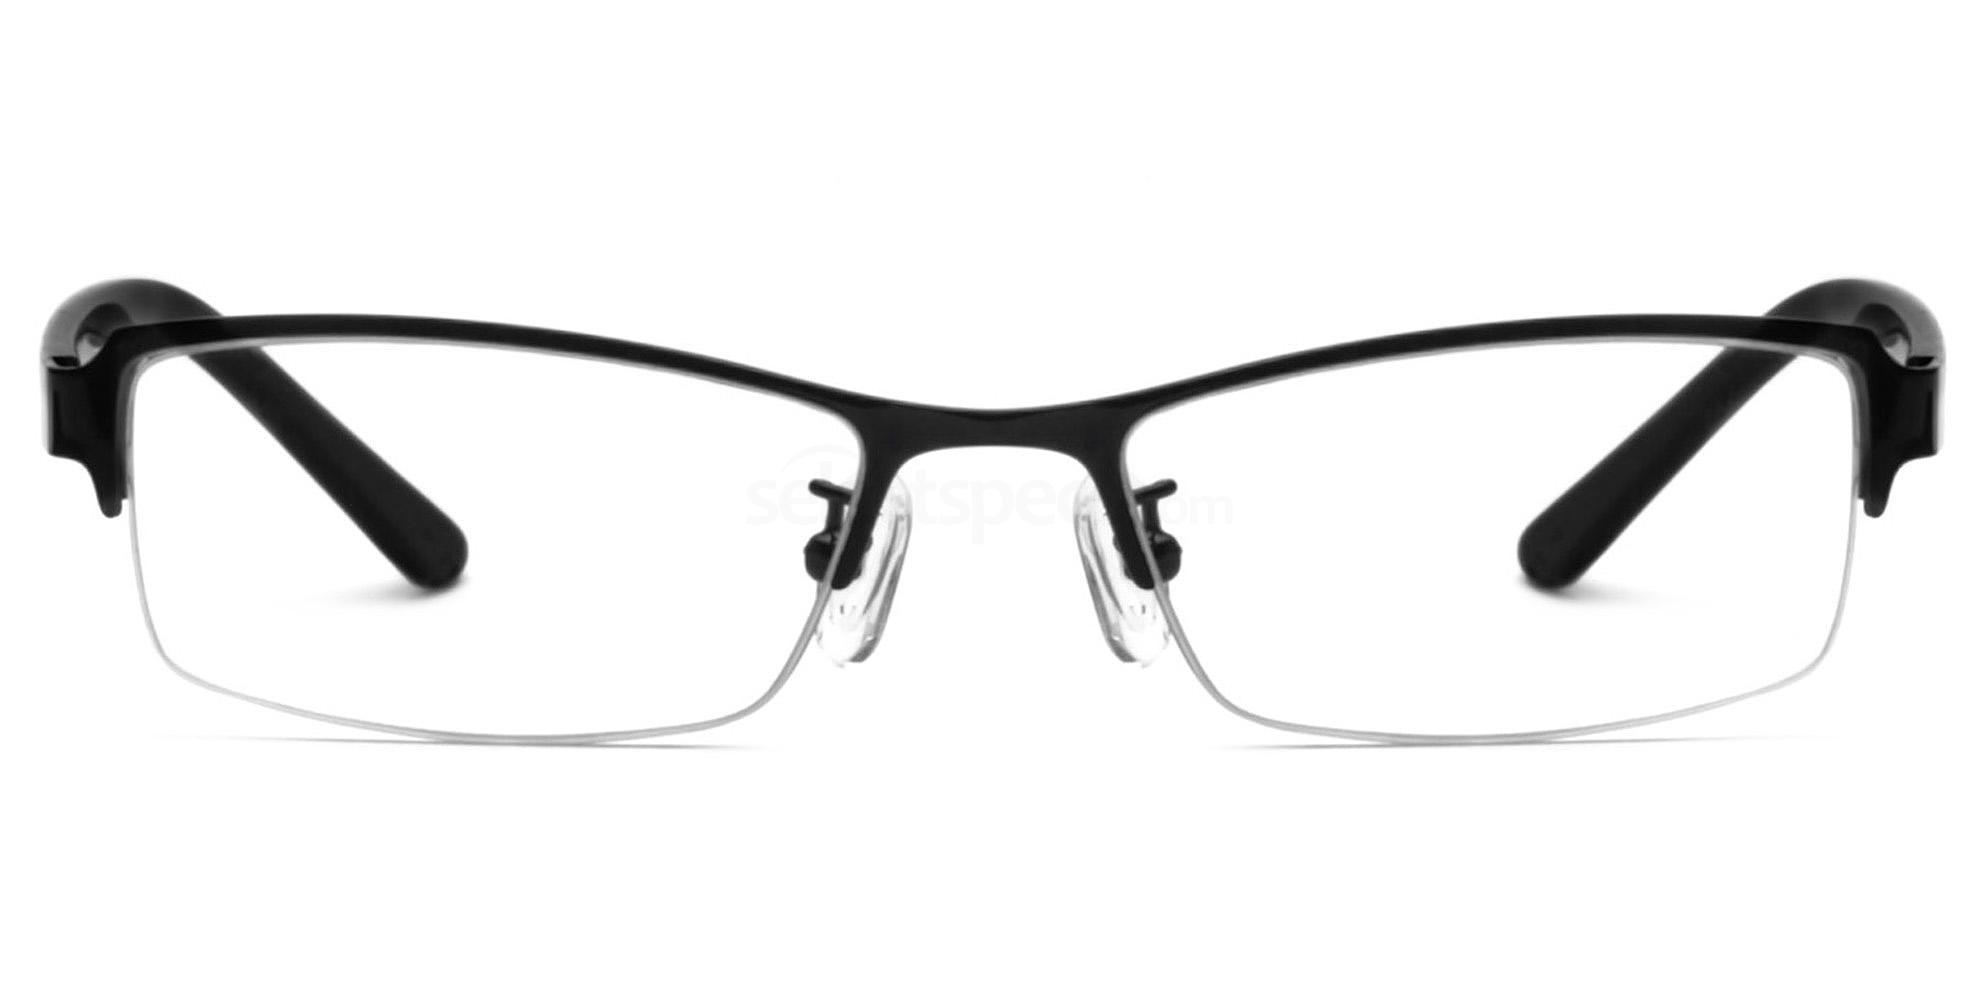 Semi-Rimless-Prescription-Glasses-SelectSpecs